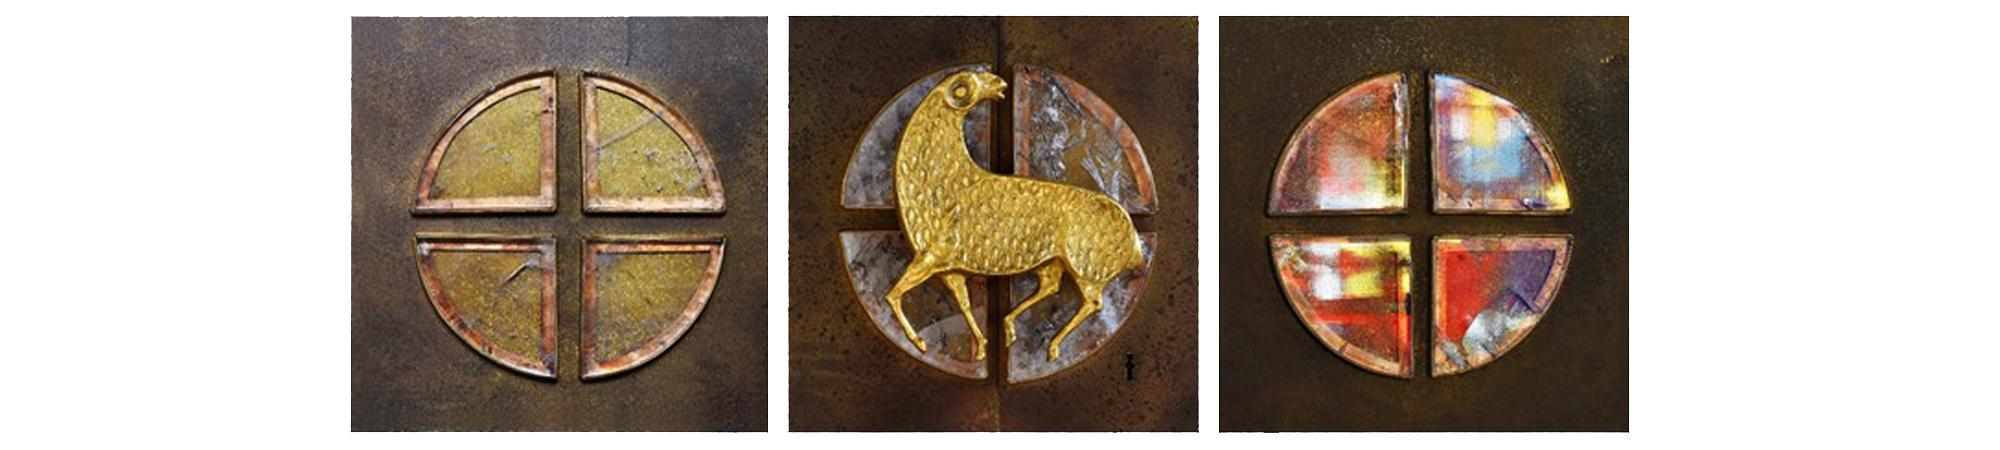 St. Josef | Tabernakel | Fotomontage